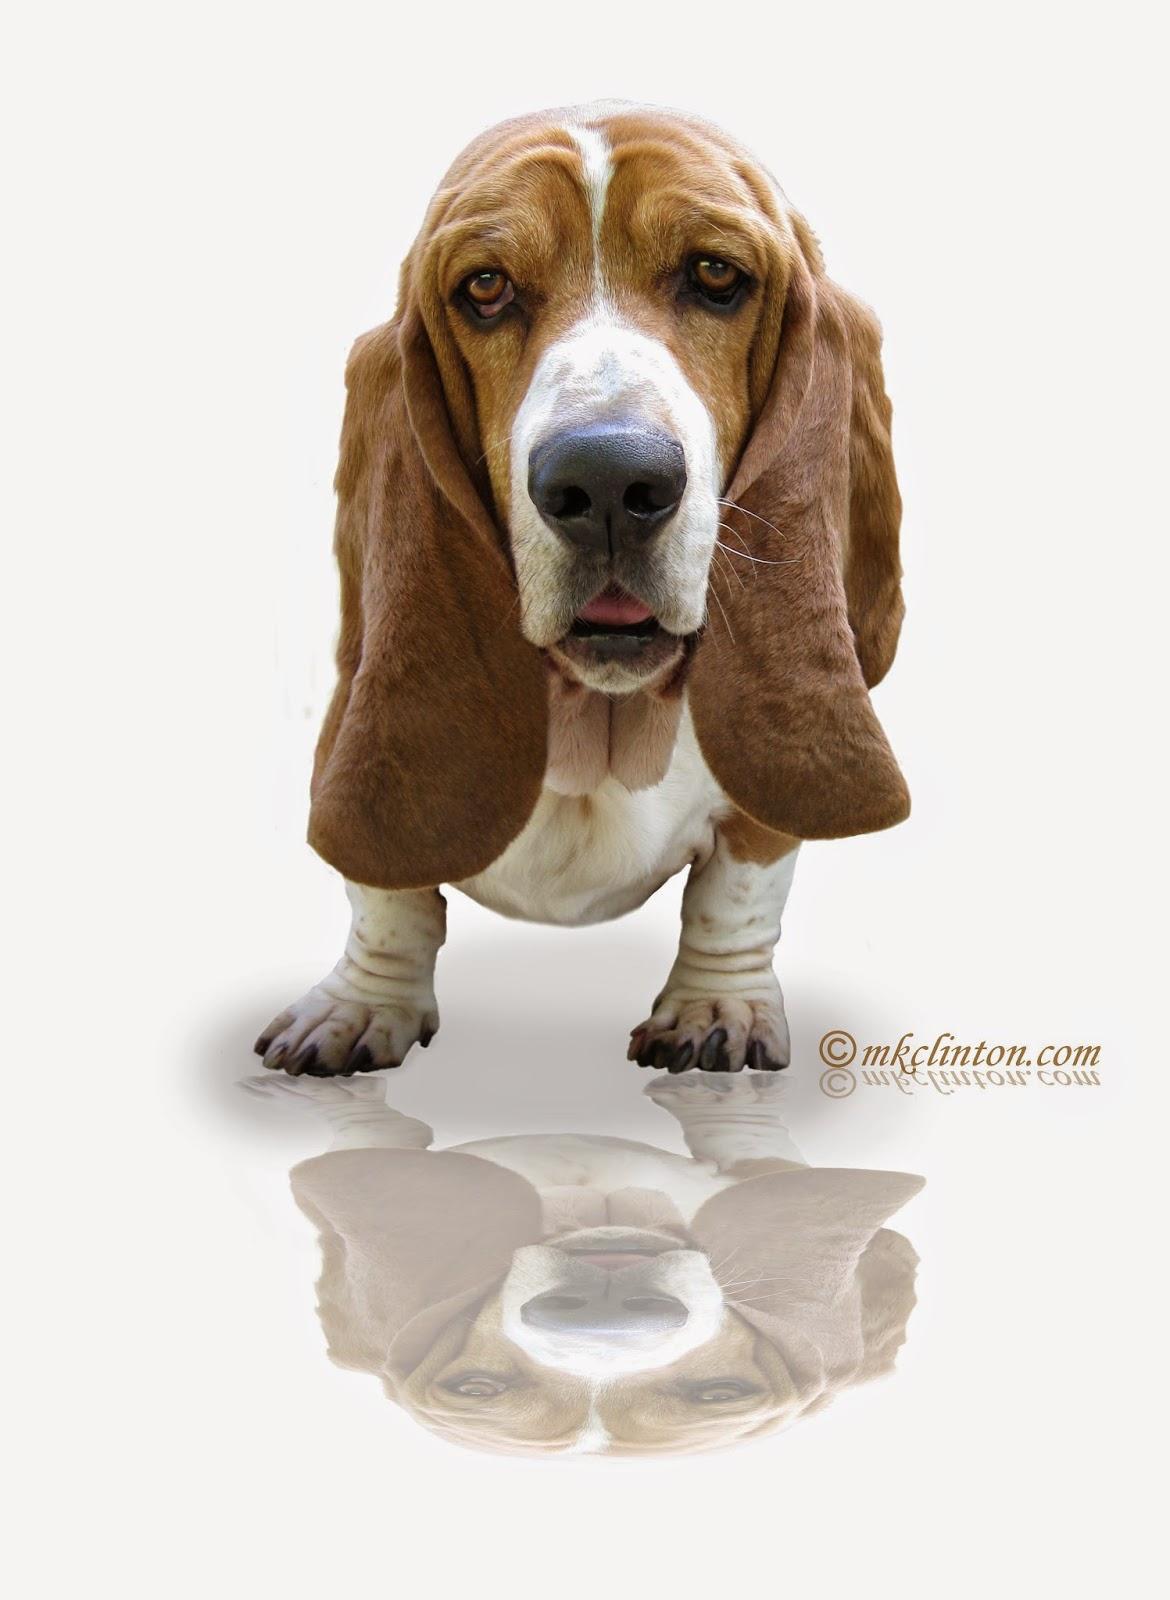 Basset Hound reflections